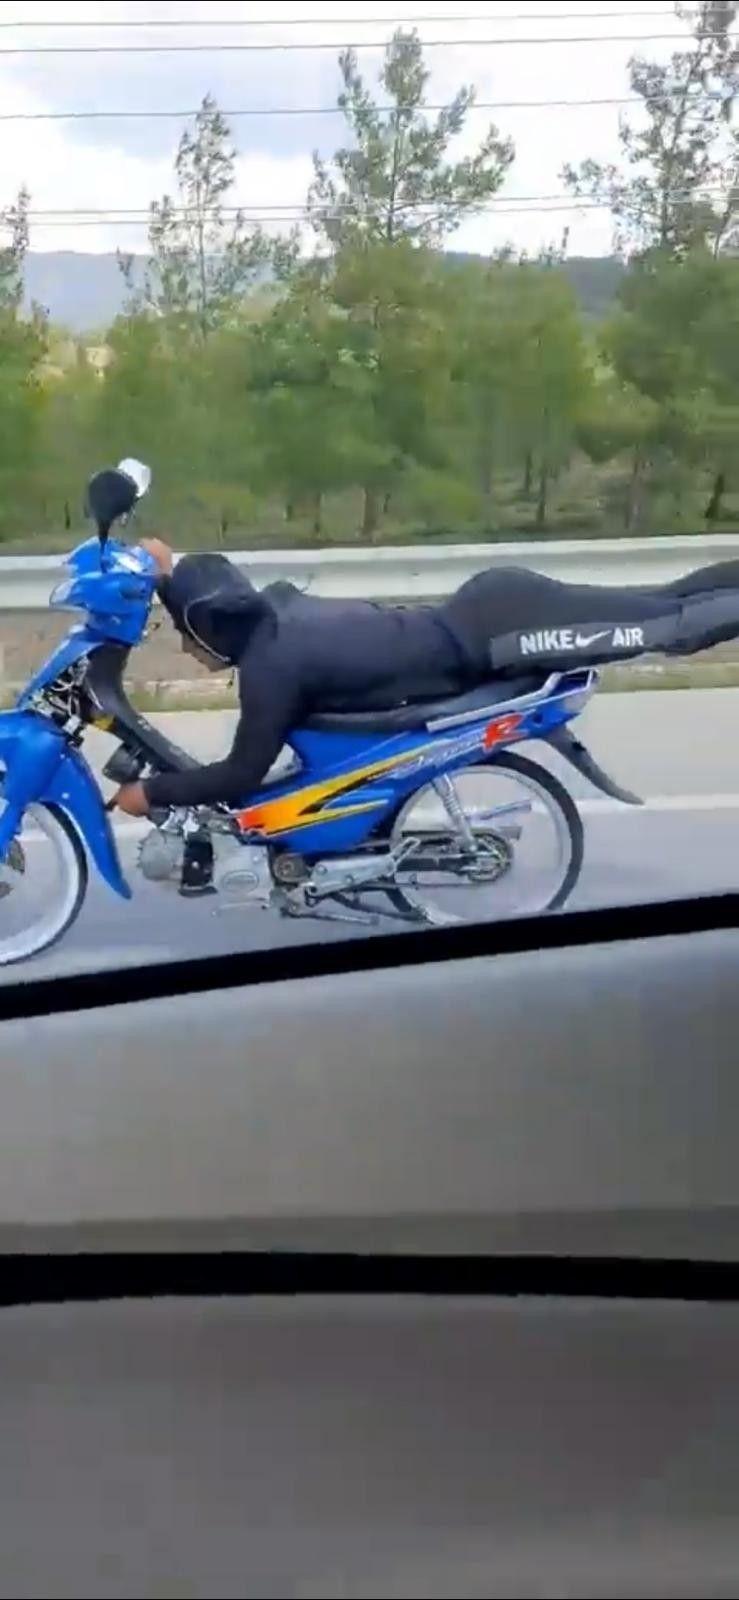 2021/04/yatarak-tek-elle-motosiklet-kullandi-20210402AW28-2.jpg